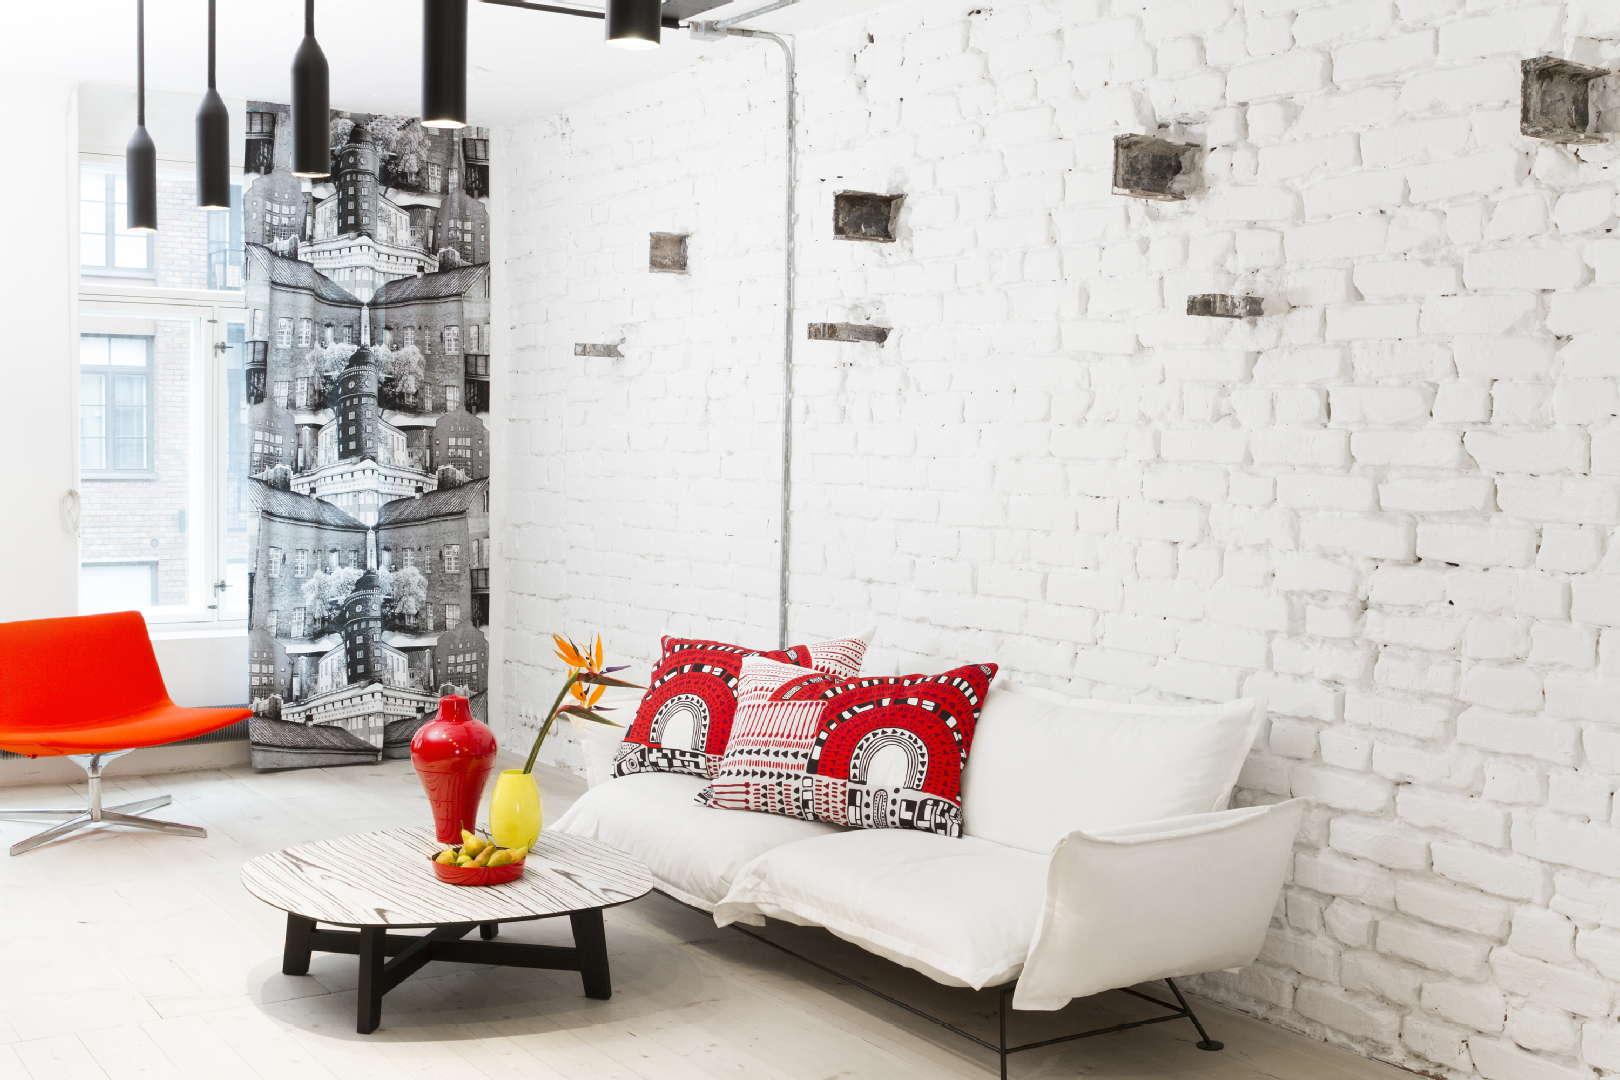 Moderni olohuone, verho tyynynpäällinen, Vallila, 54f044f7498ec414915c0fec